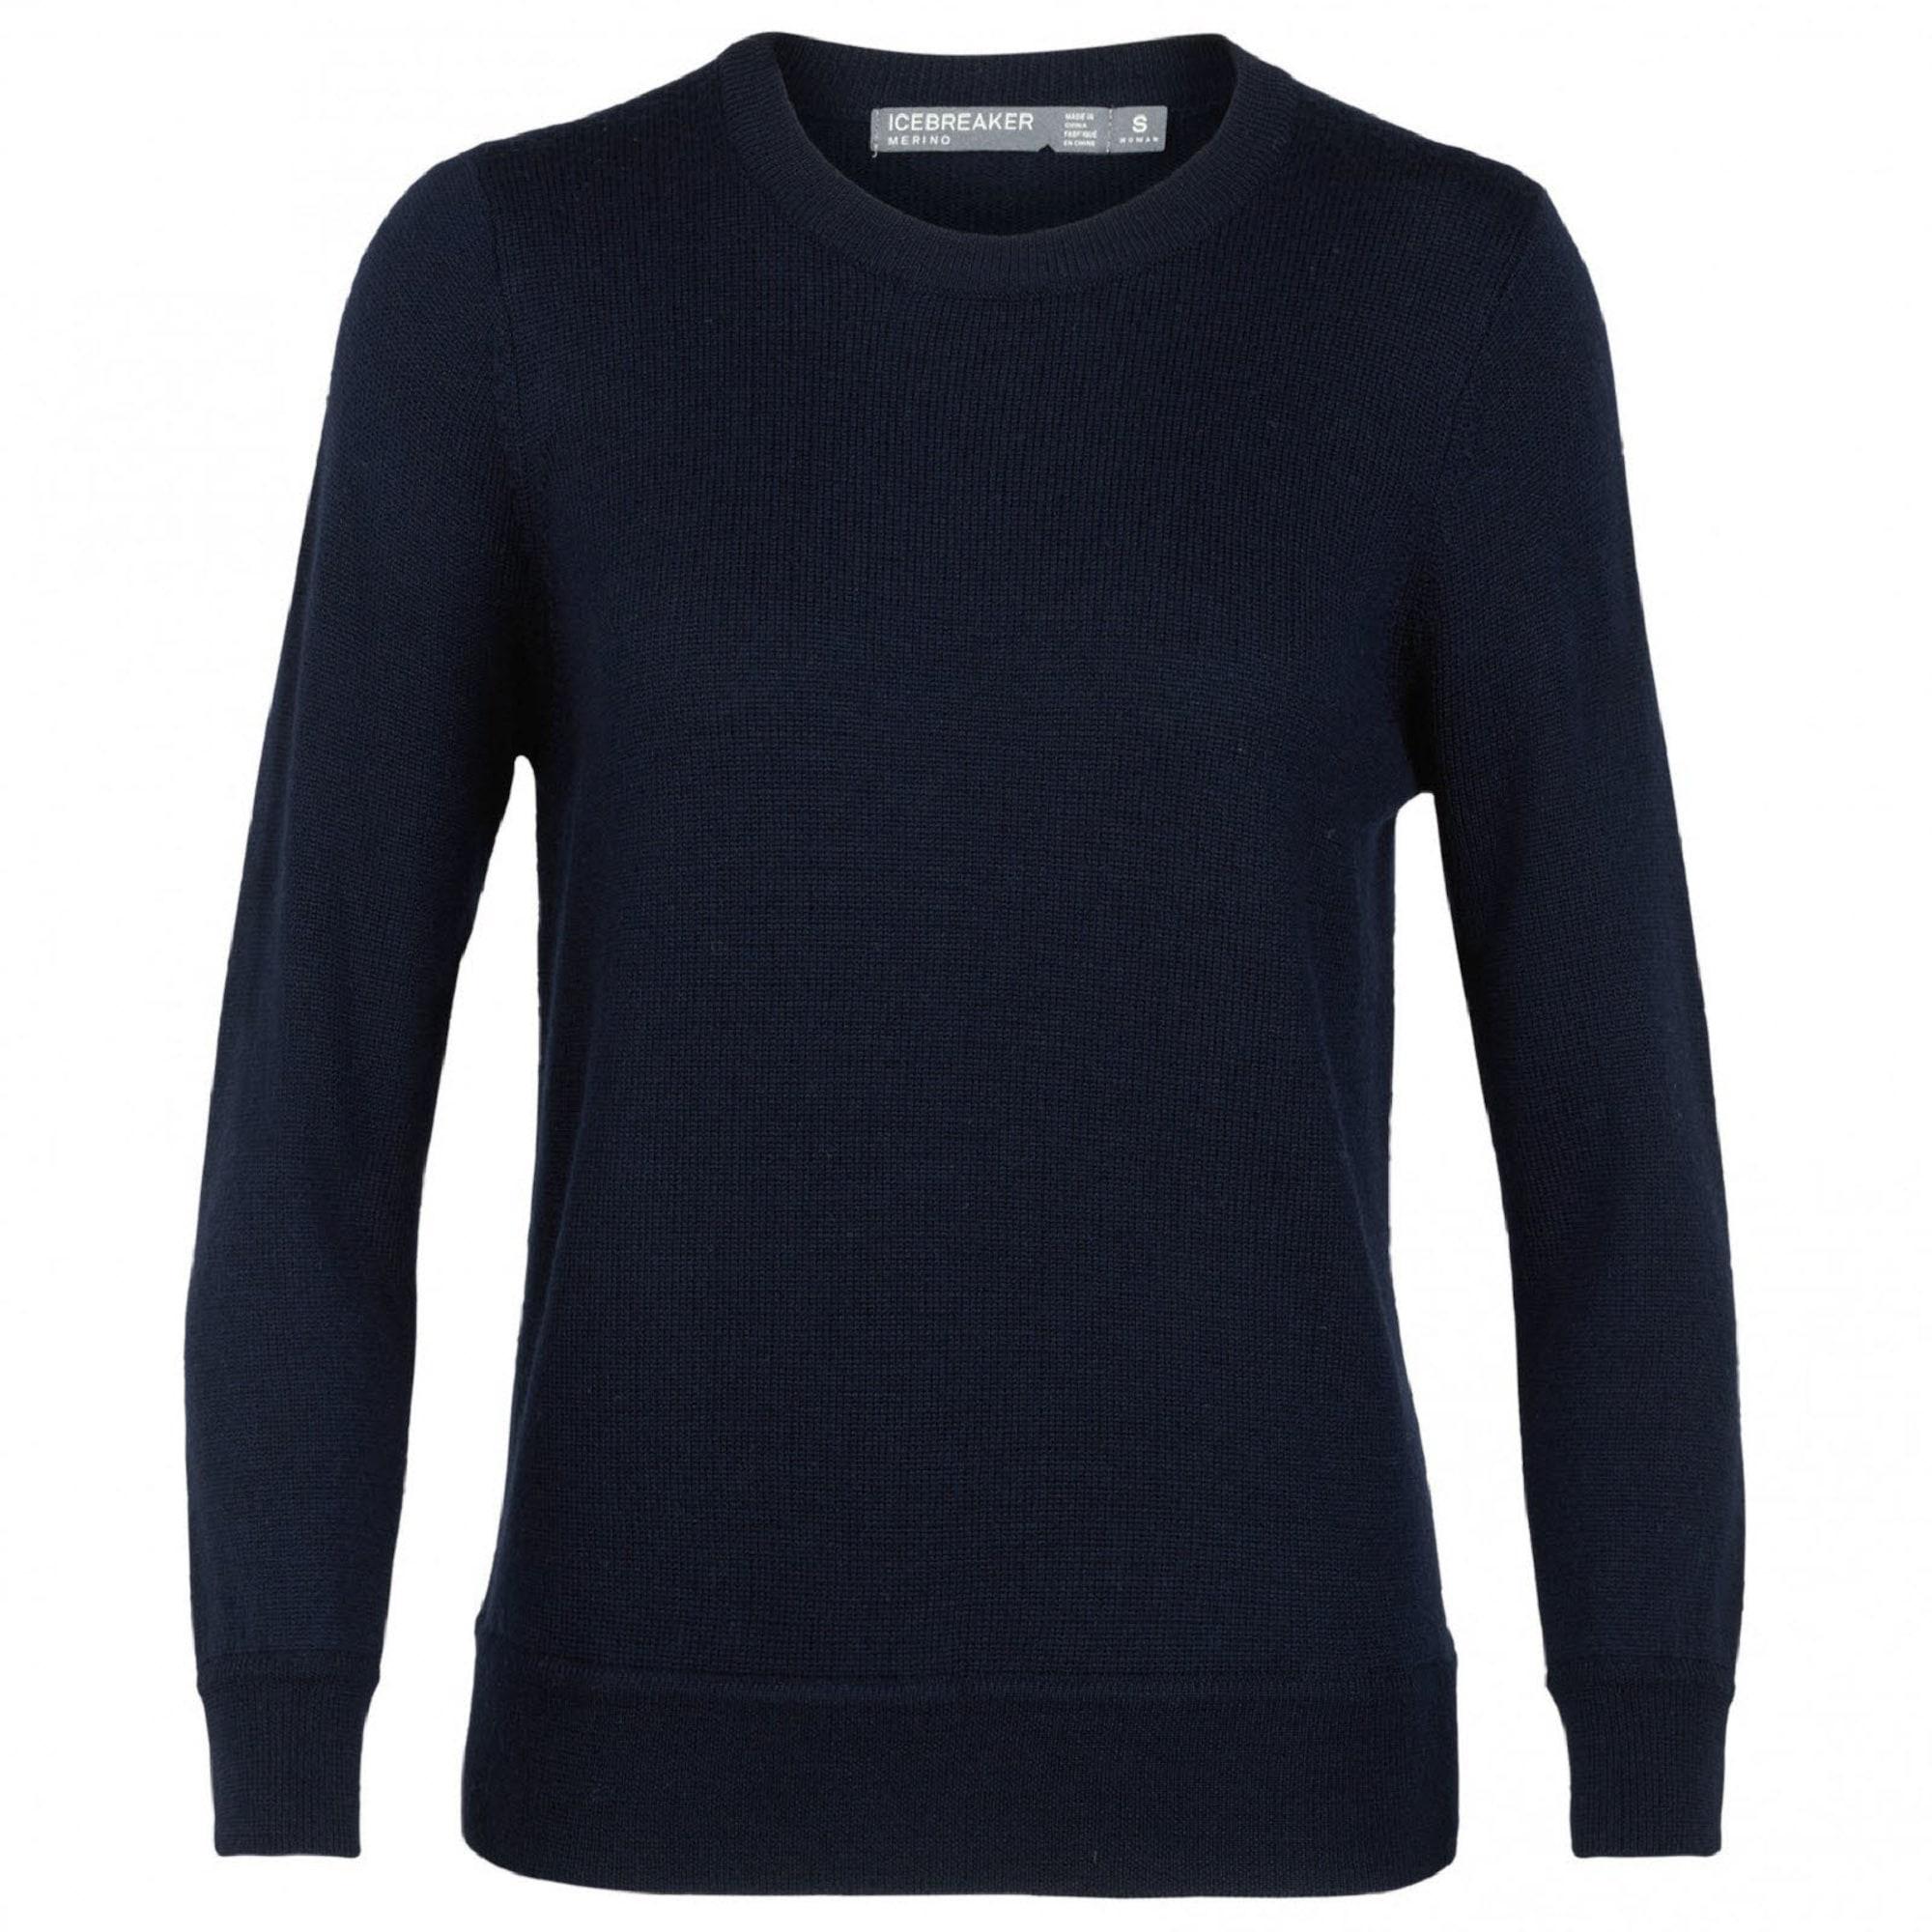 Sweater 'Muster Crewe'   Bekleidung > Sweatshirts & -jacken > Sweatshirts   Icebreaker